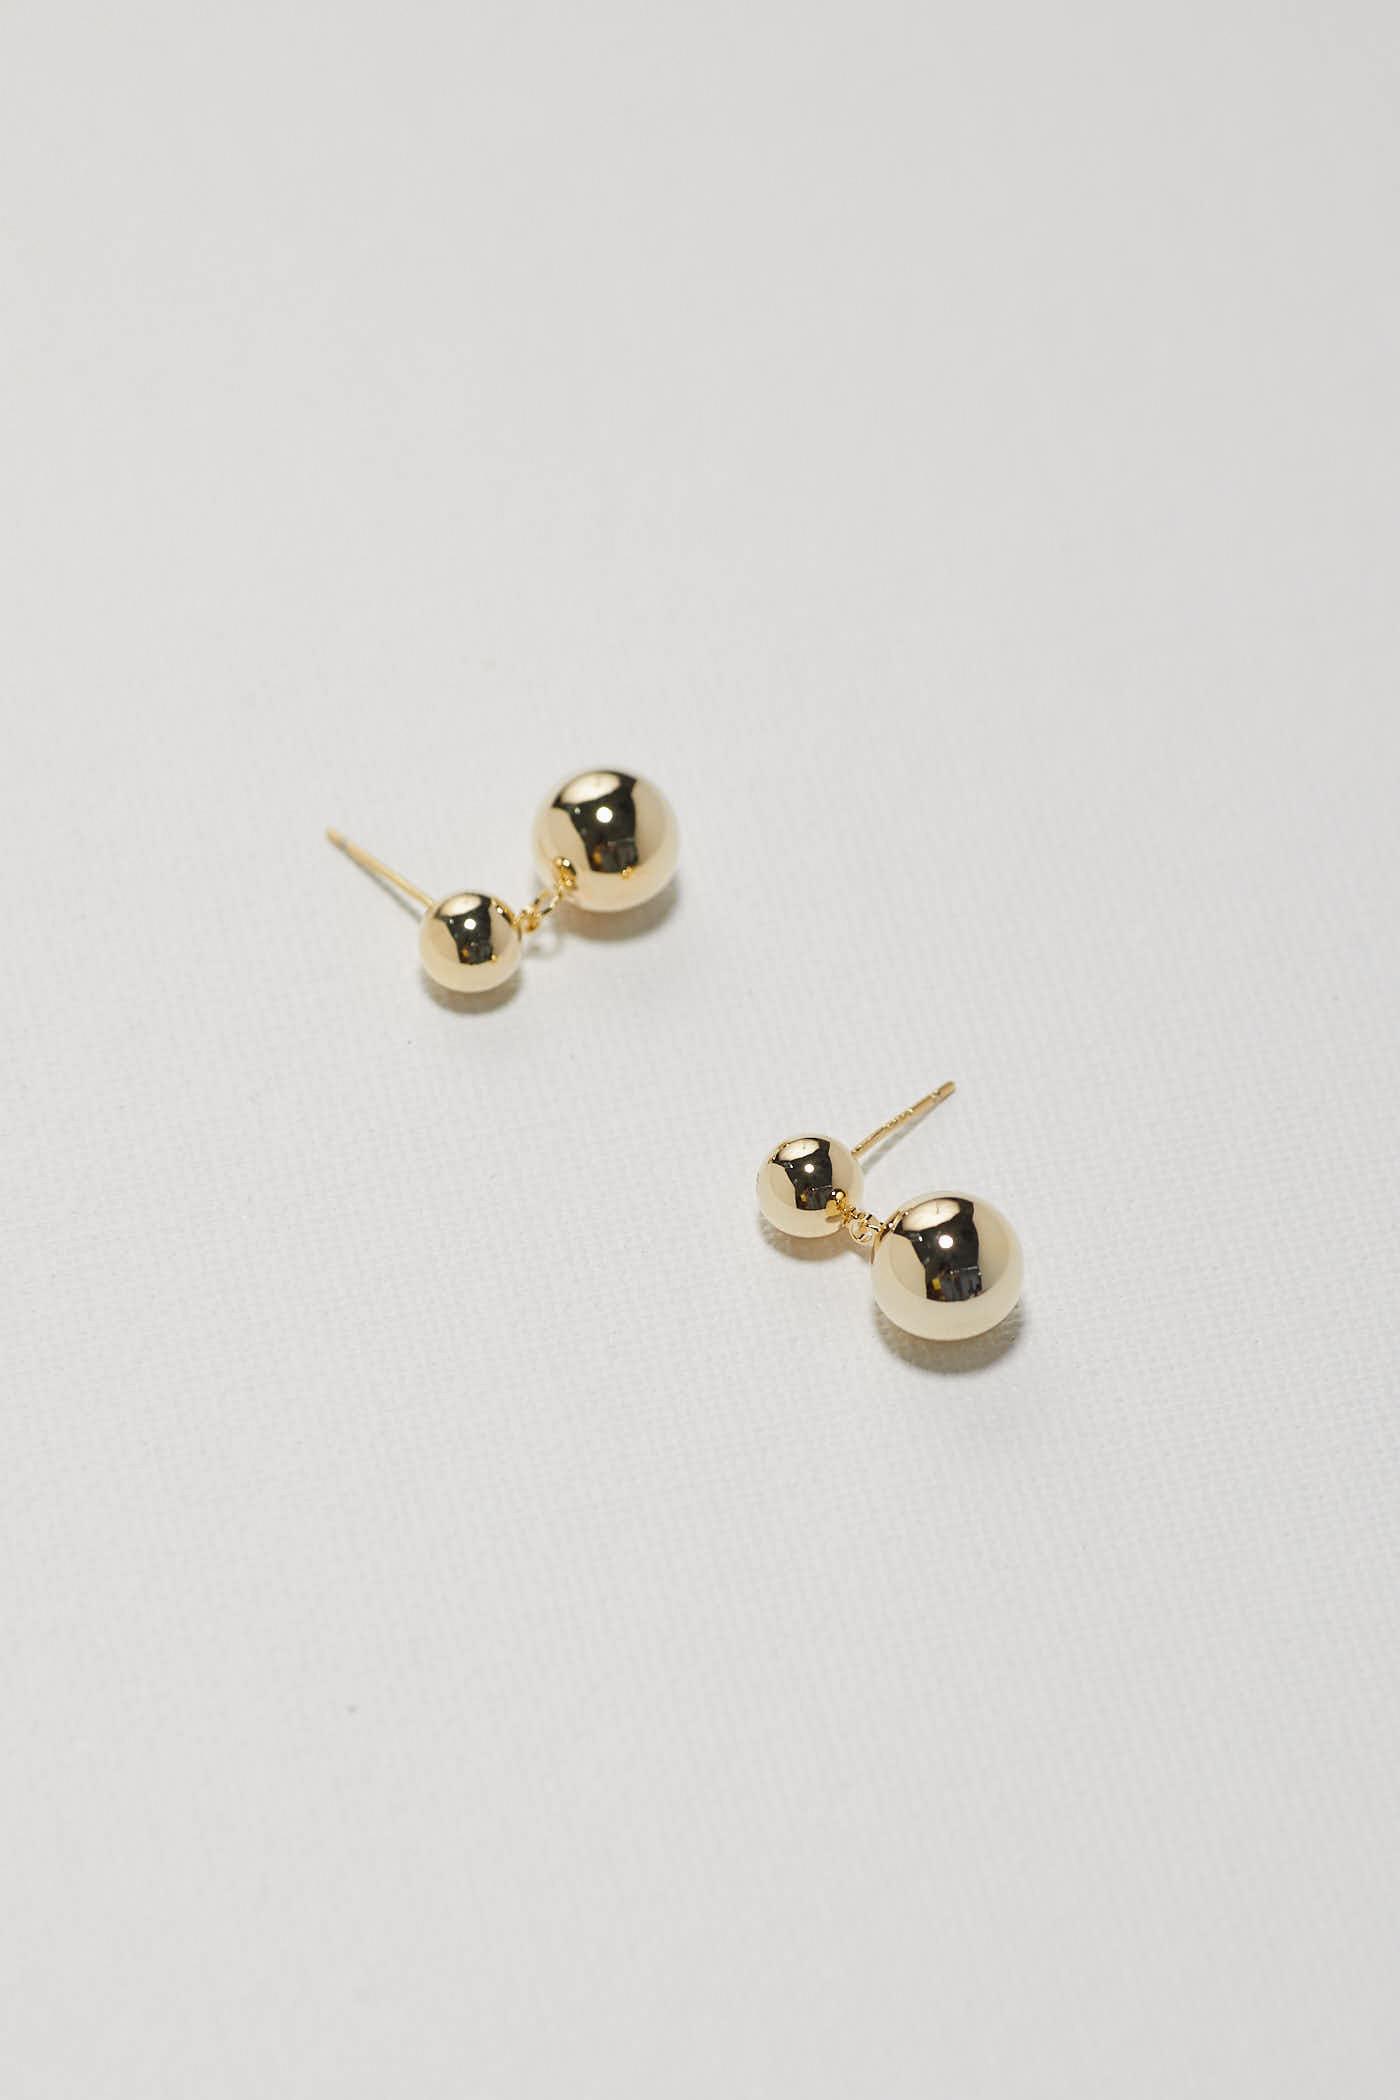 Kiku Earrings